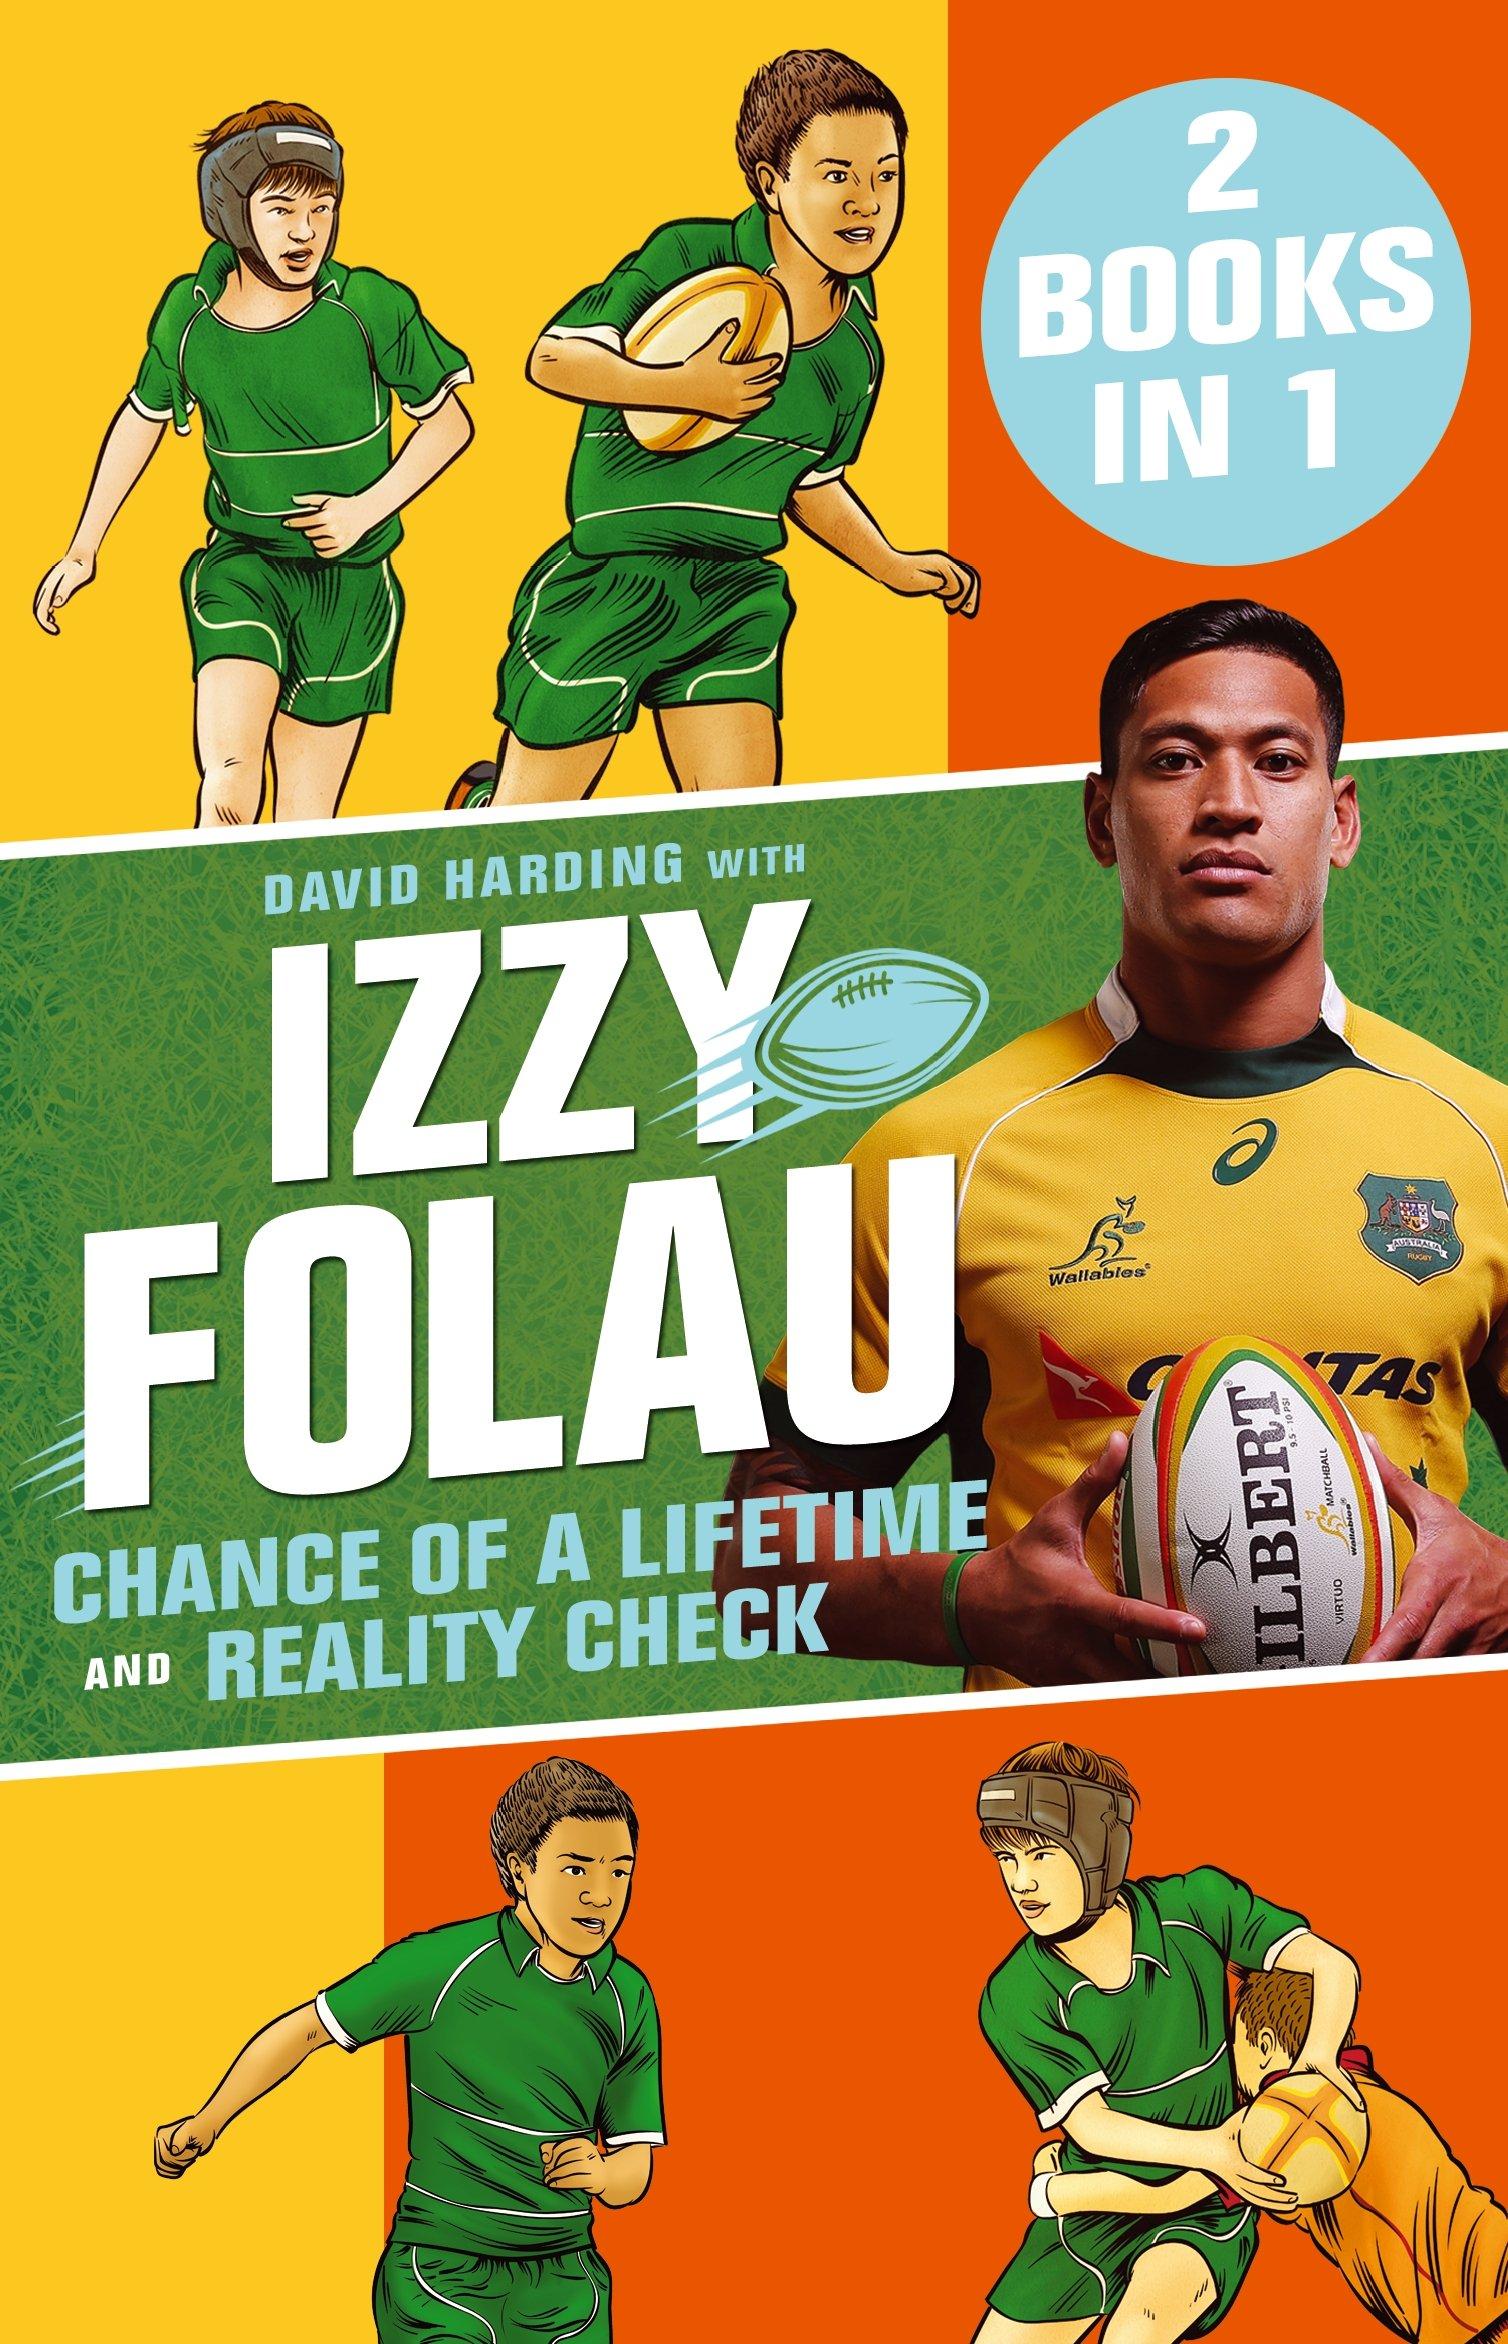 Download Chance of a Lifetime and Reality Check: Izzy Folau Bindup 1 ePub fb2 ebook